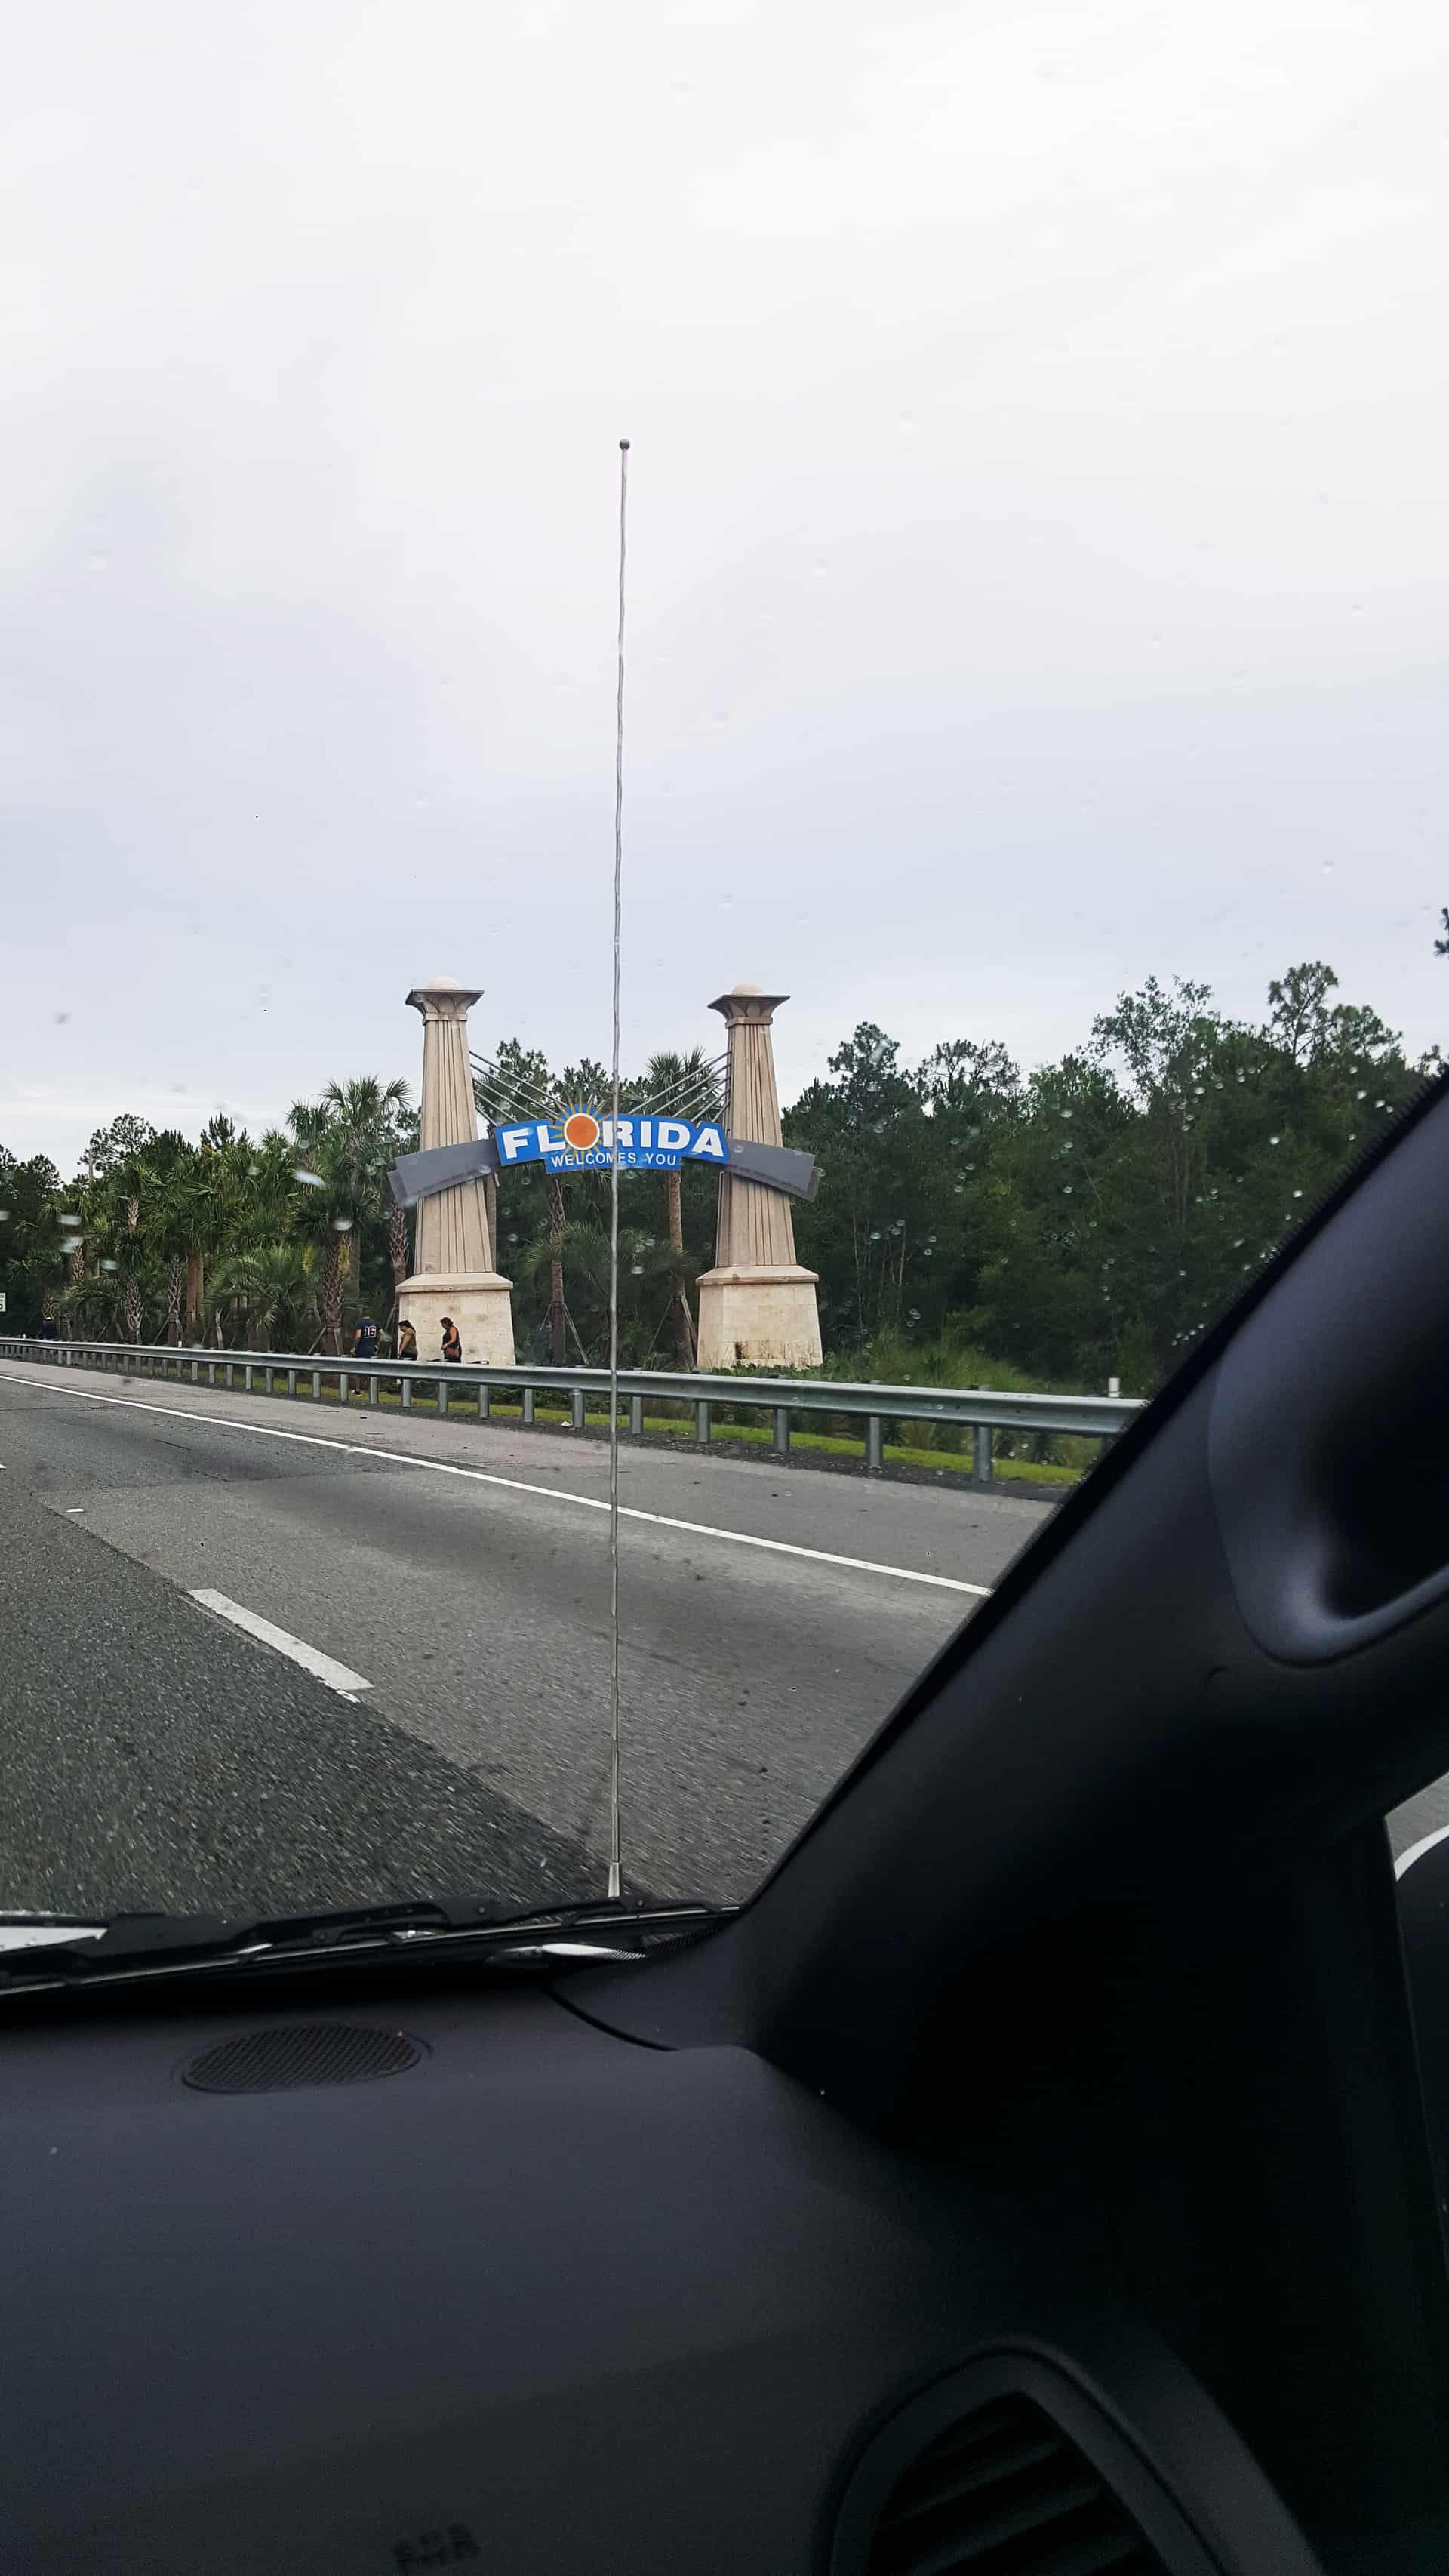 Legoland Florida Vacation - Review and Tips